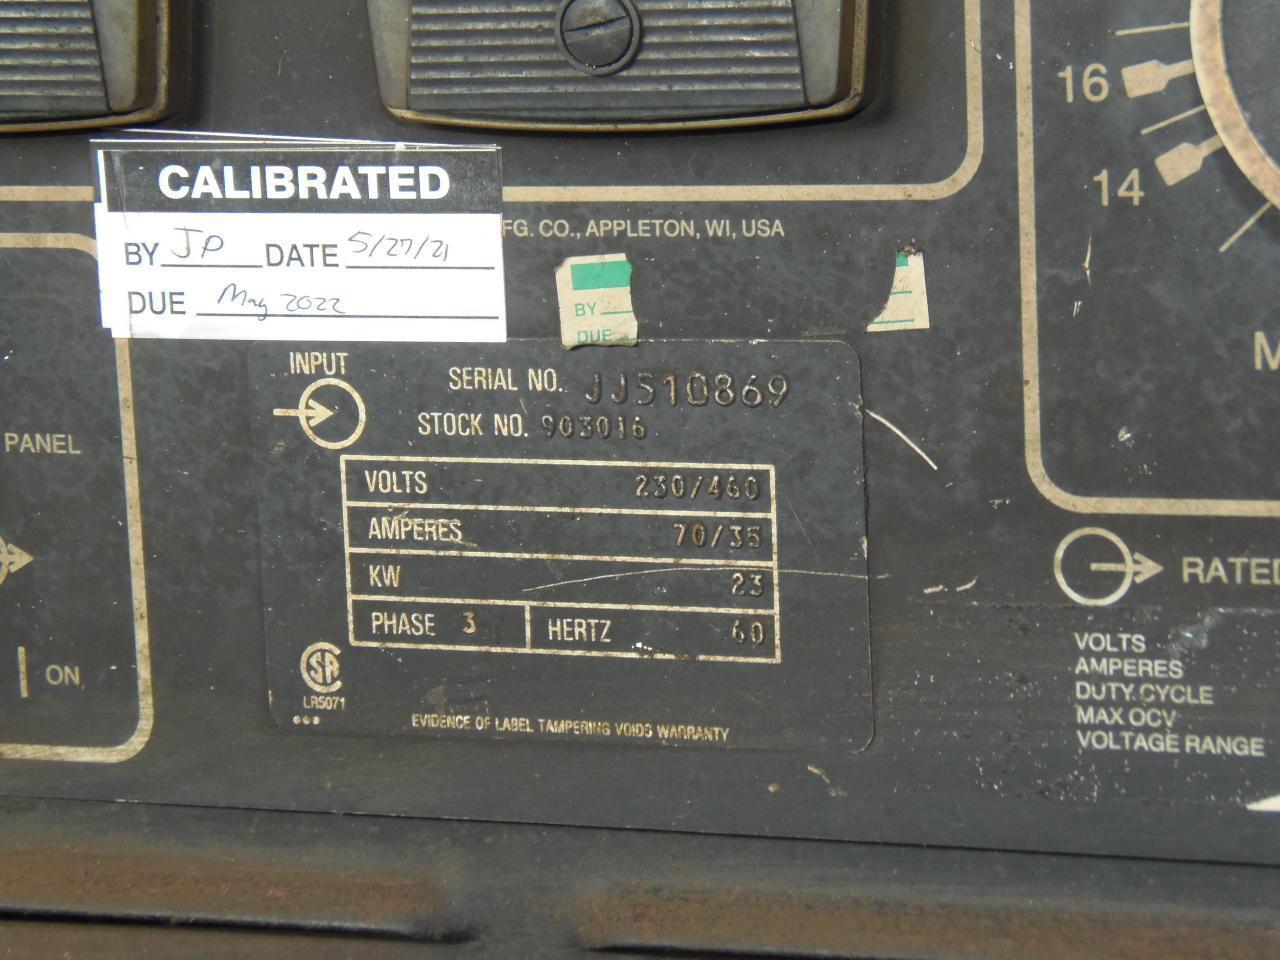 Miller 650 Amp Wire Feed Welder, model Deltaweld 651 with D54D feeder